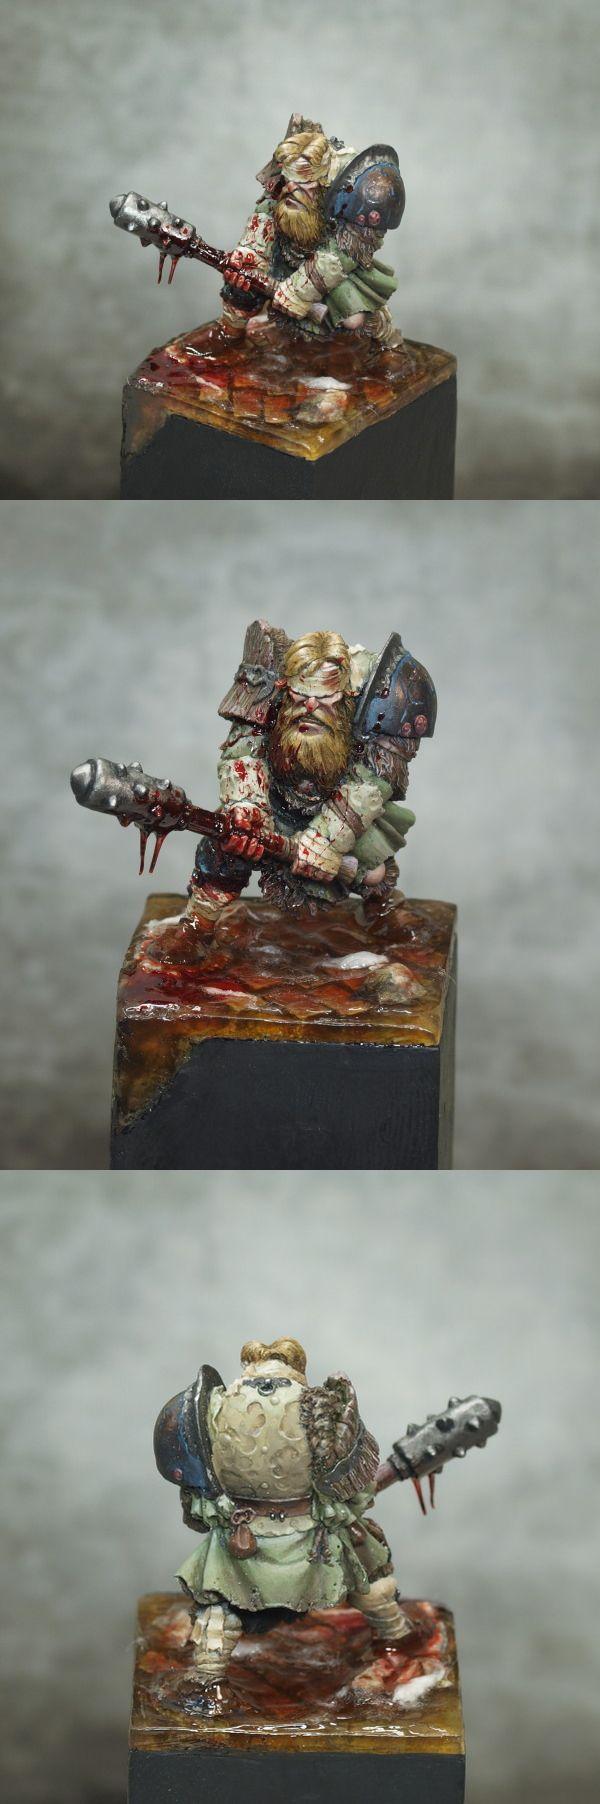 Brom the Gutter Dwarf